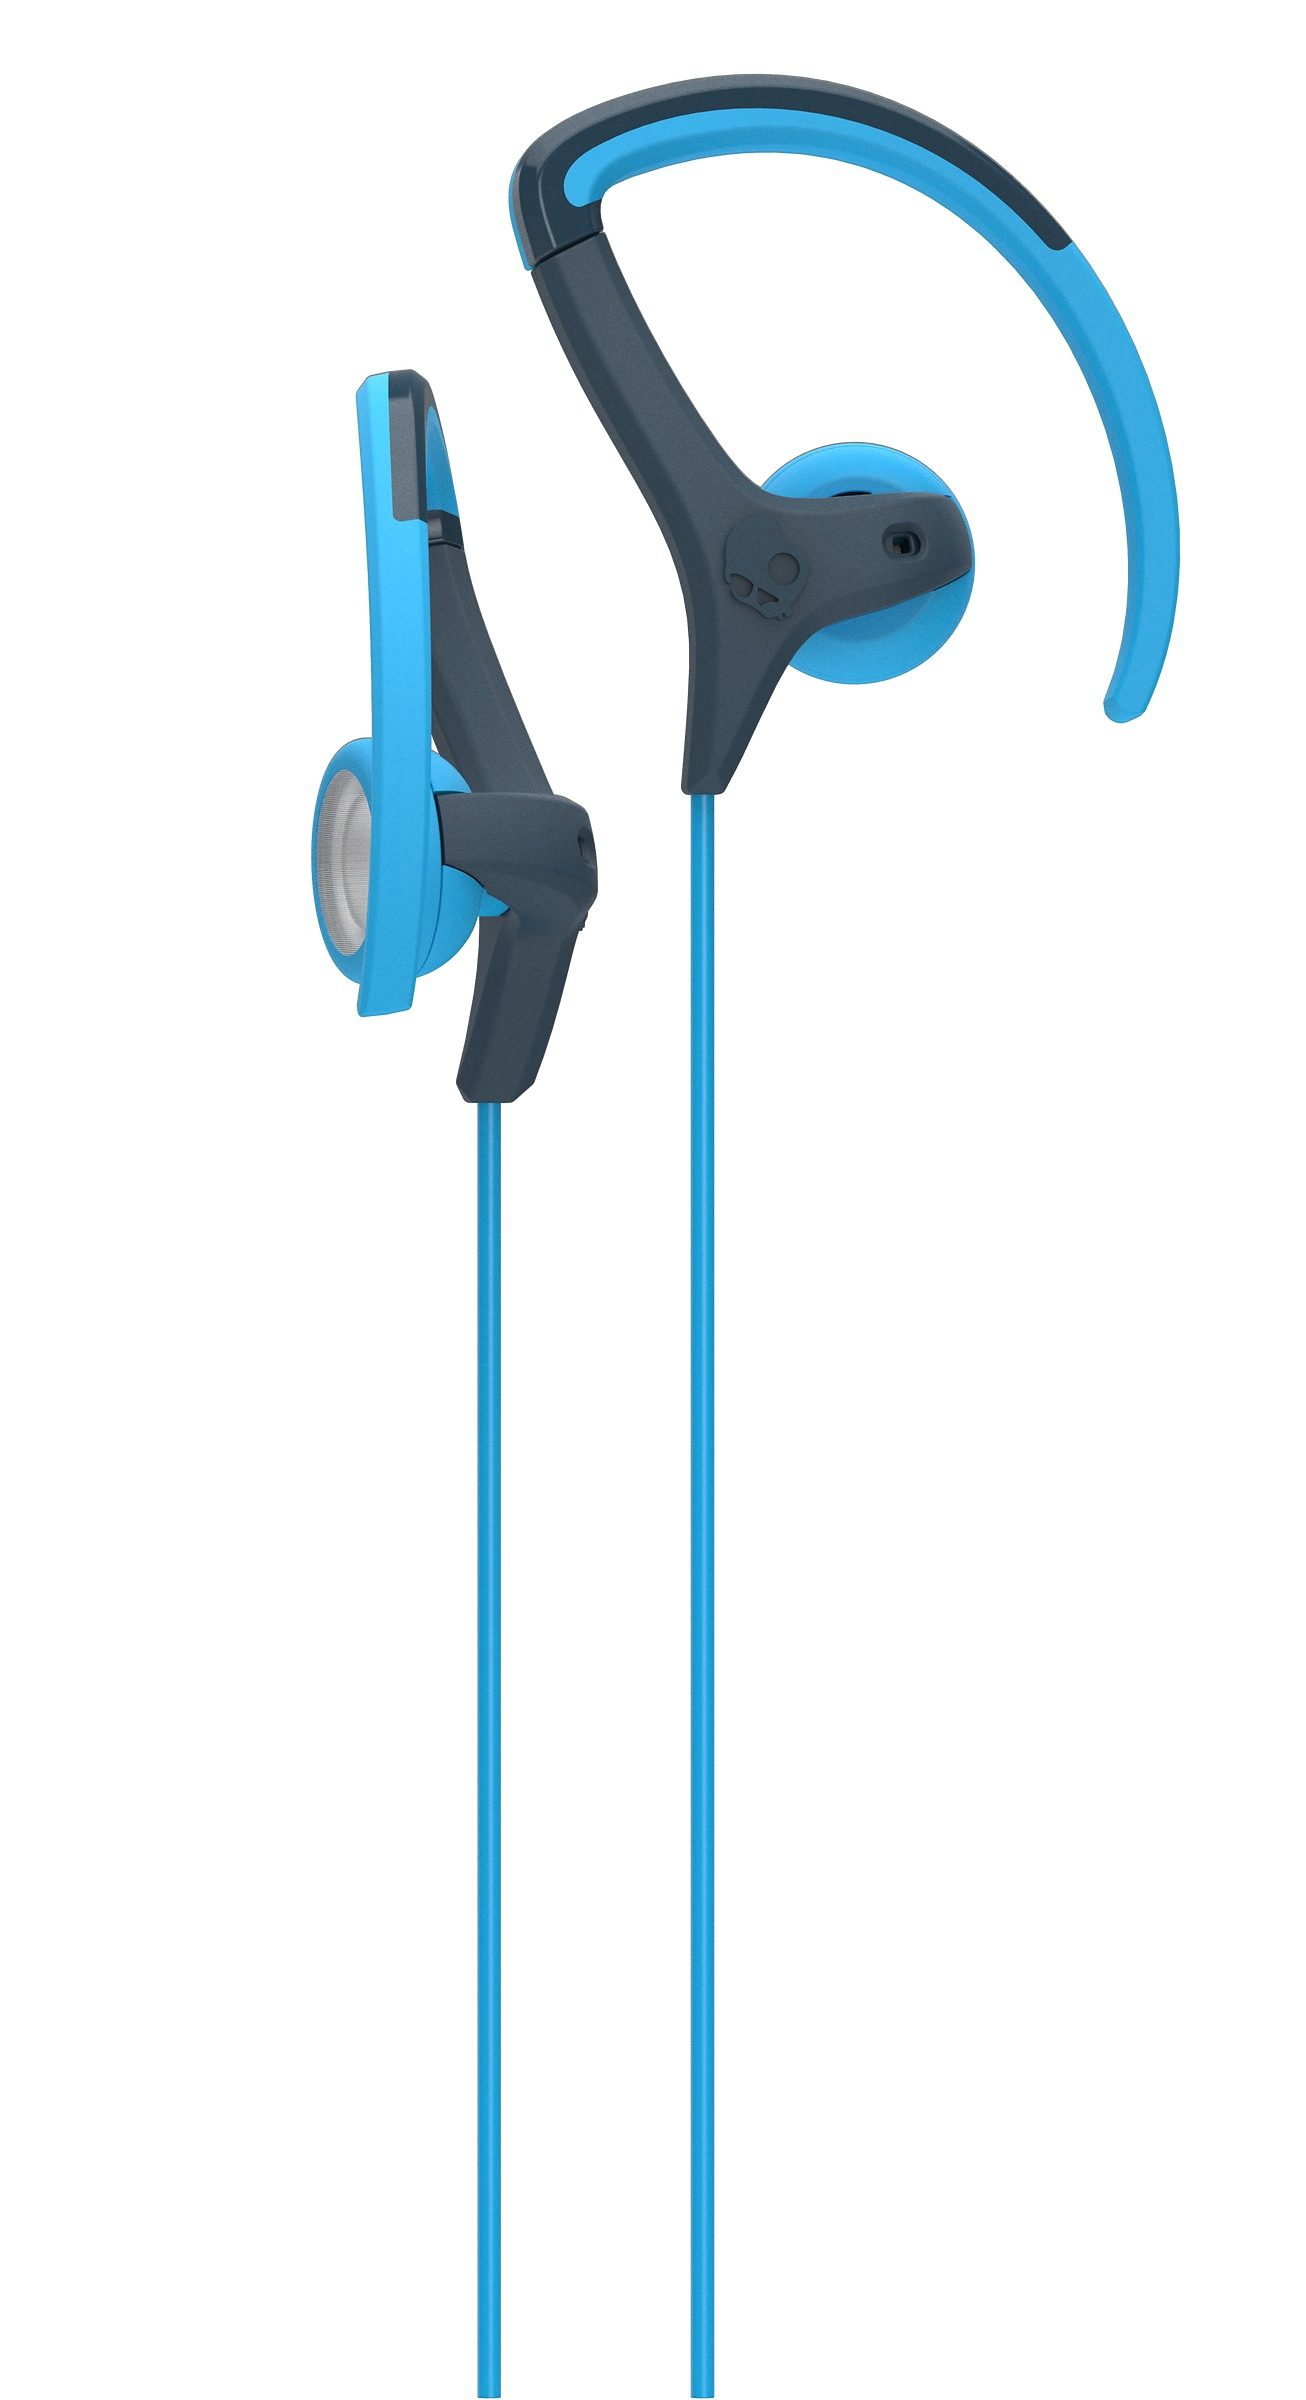 Skullcandy Kopfhörer »CHOPS BUD HANGER W/O MIC NAVY/BLUE/BLUE«